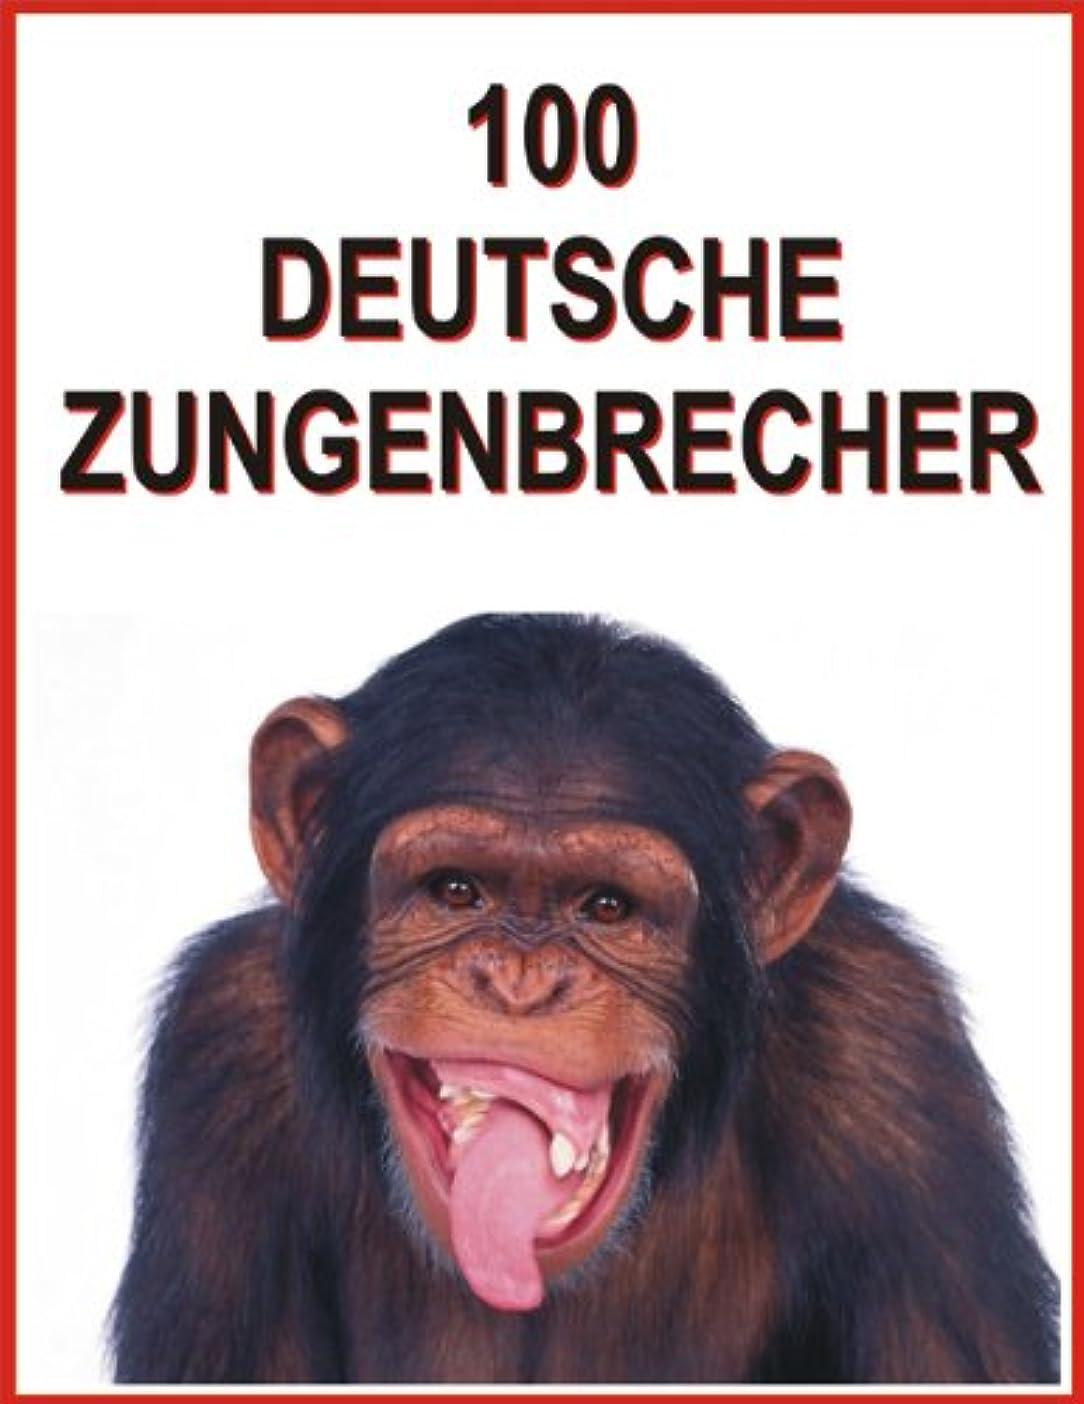 噴水ノート自己100 Deutsche Zungenbrecher (German Edition)